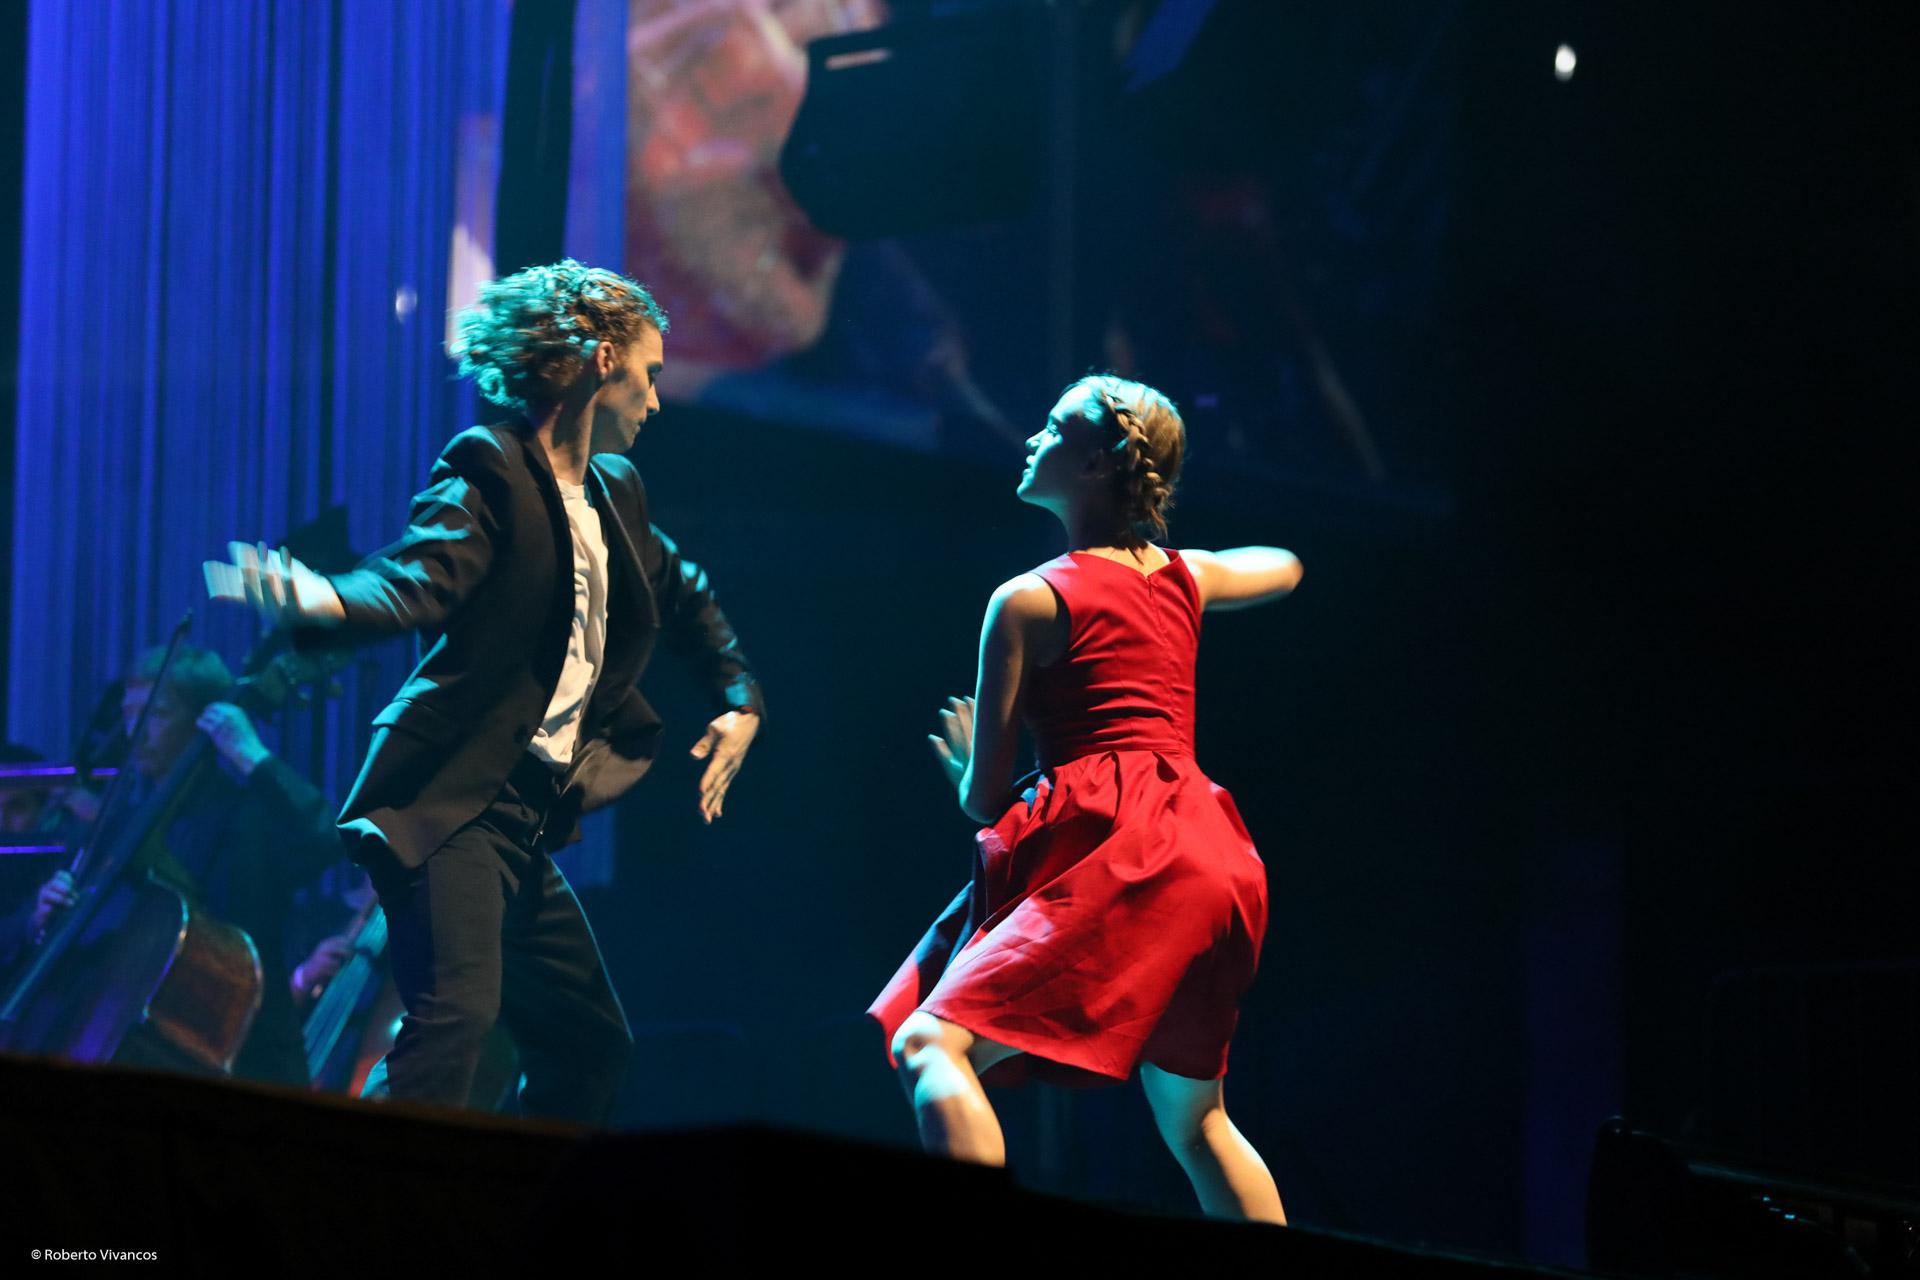 Andrea Bocelli Live Concert